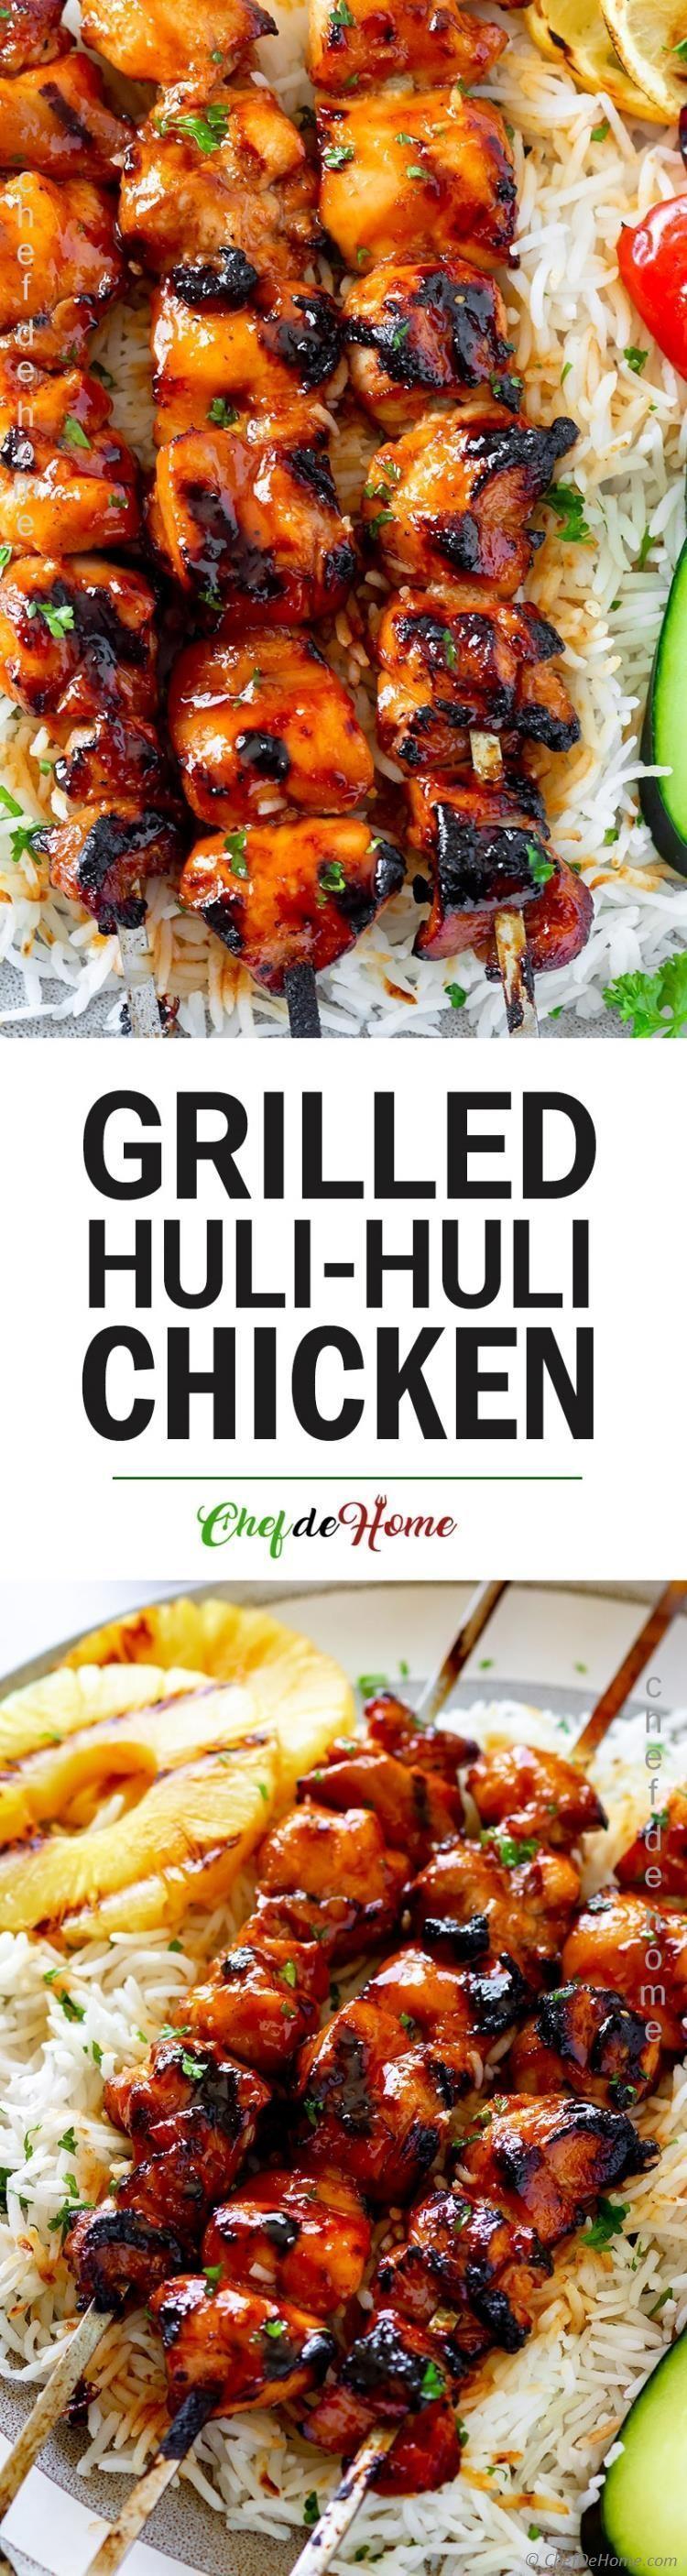 An easy and flavorful Huli Huli Chicken recipe with homemade pineapple-ginger Huli Huli Sauce and same Hawaiian grilled Huli Huli chicken flavor. An easy and flavorful Huli Huli Chicken recipe with homemade pineapple-ginger Huli Huli Sauce and same Hawaiian grilled Huli Huli chicken flavor.